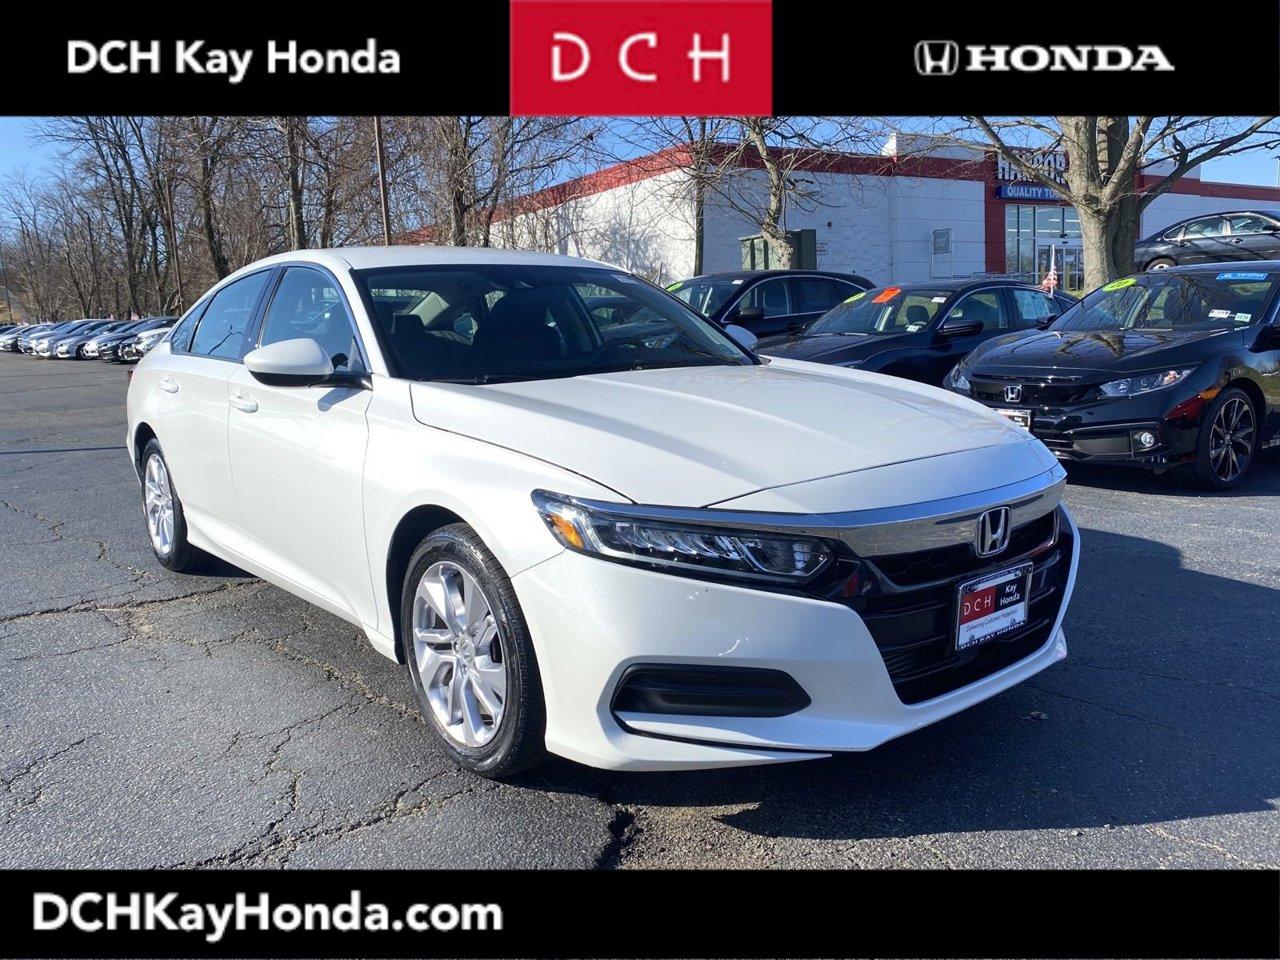 Used 2018 Honda Accord Sedan in Eatontown, NJ